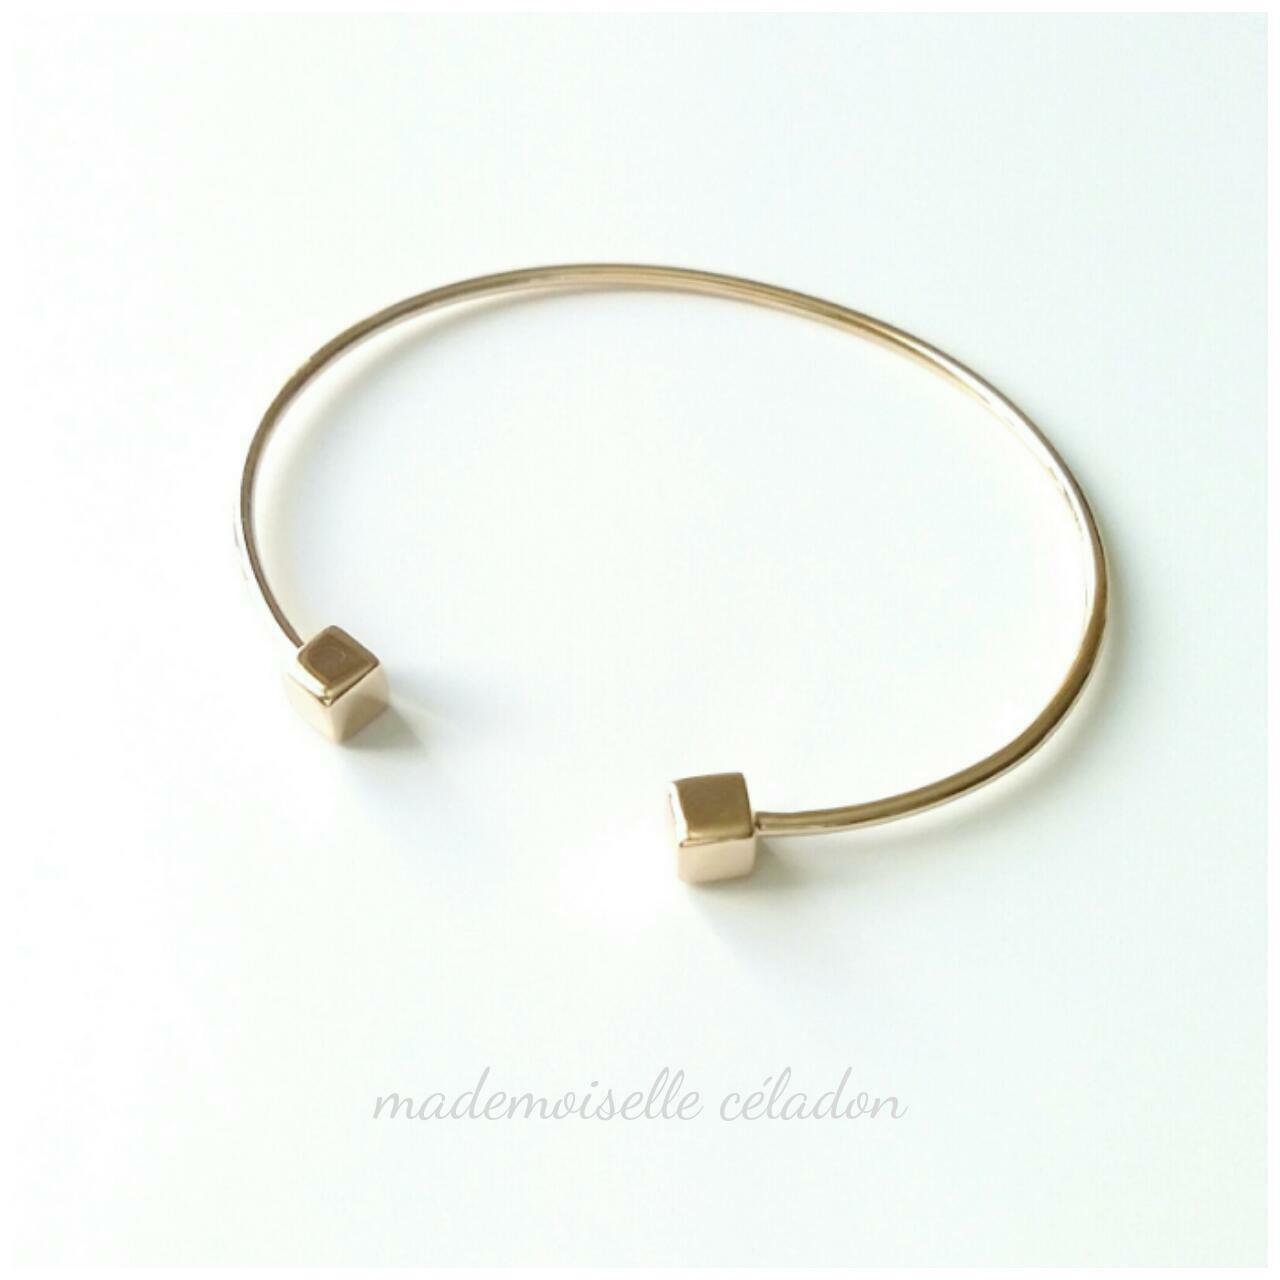 jonc plaque or 18 carats bracelet minimaliste jonc. Black Bedroom Furniture Sets. Home Design Ideas